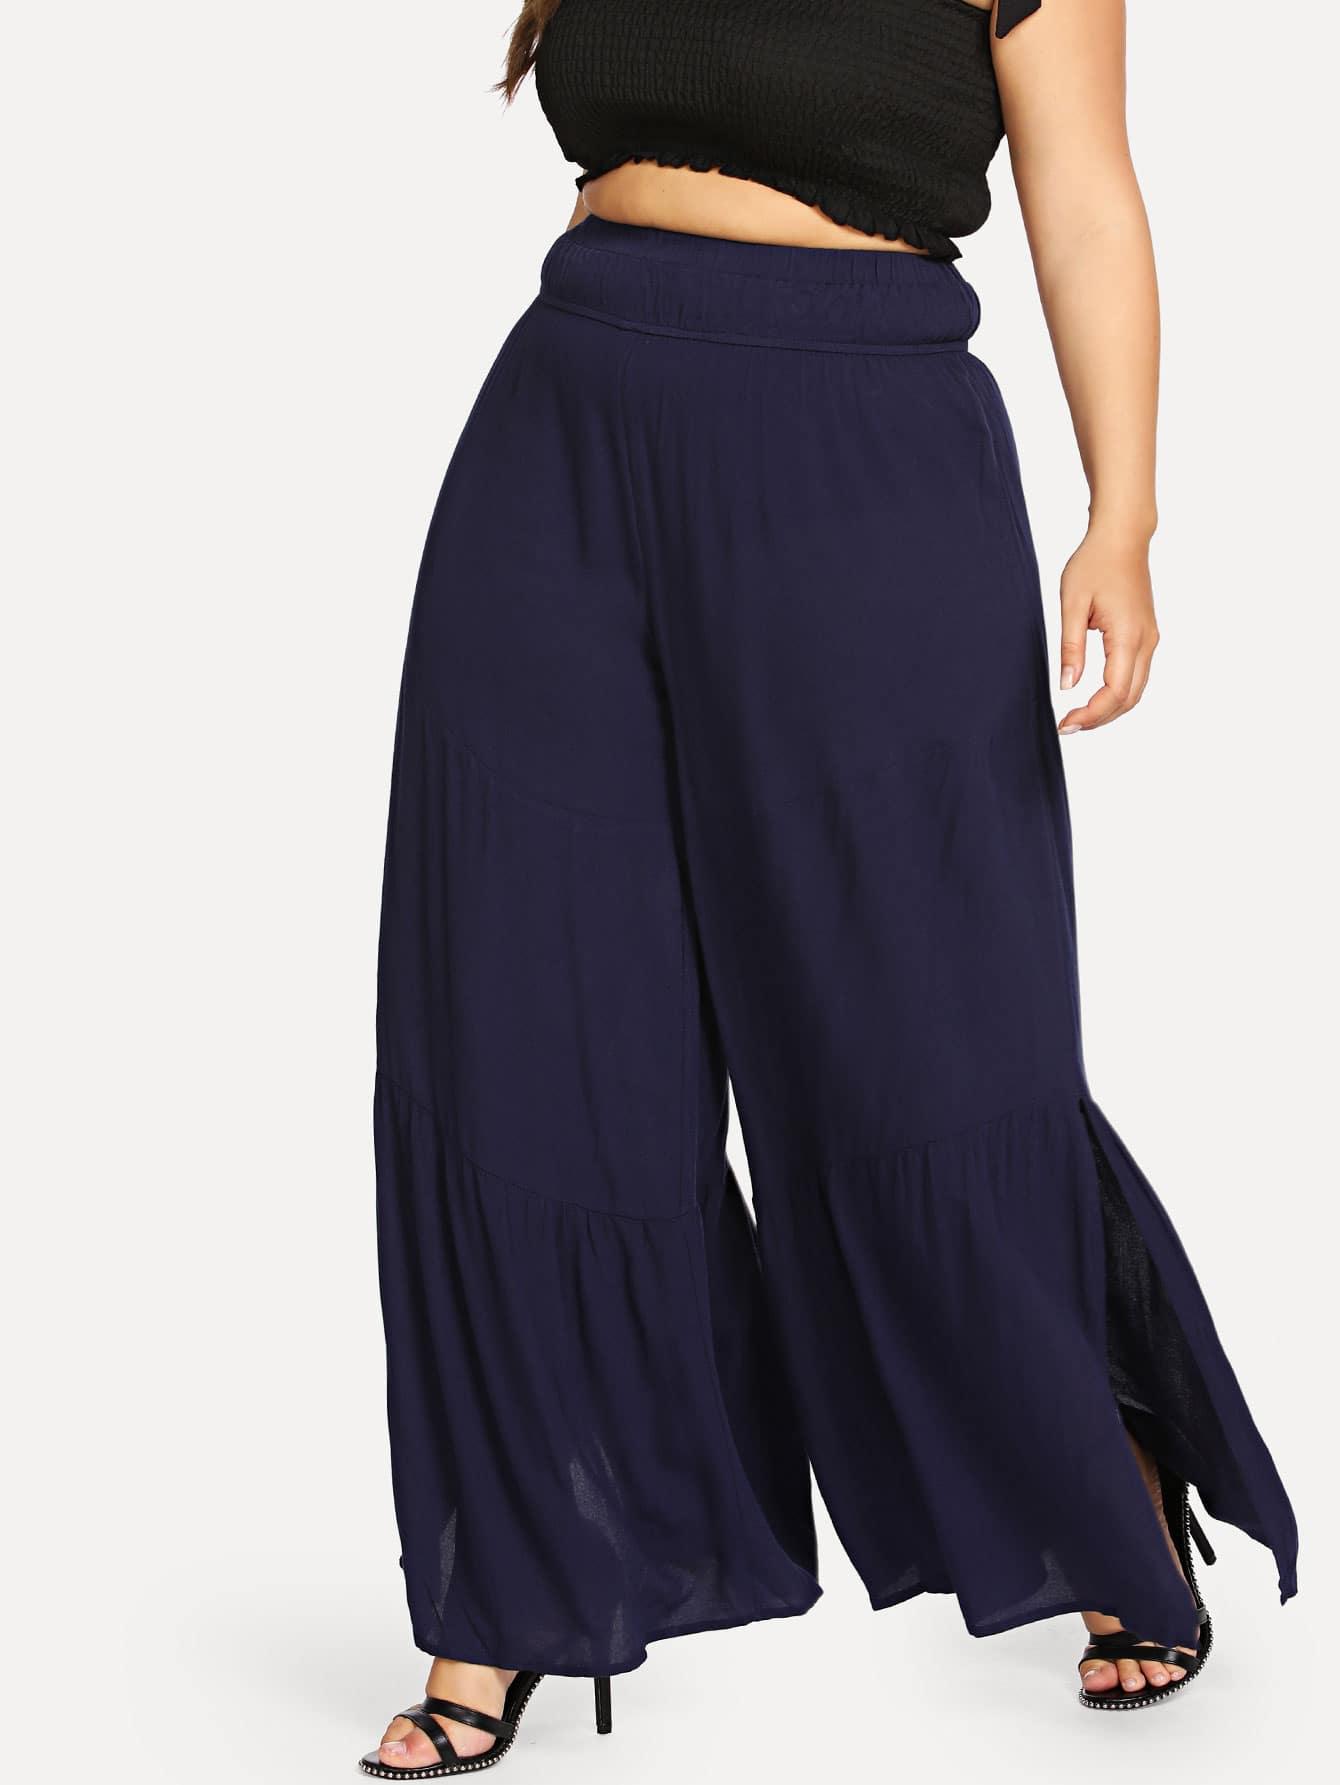 Купить Широкие брюки со сборками, Franziska, SheIn